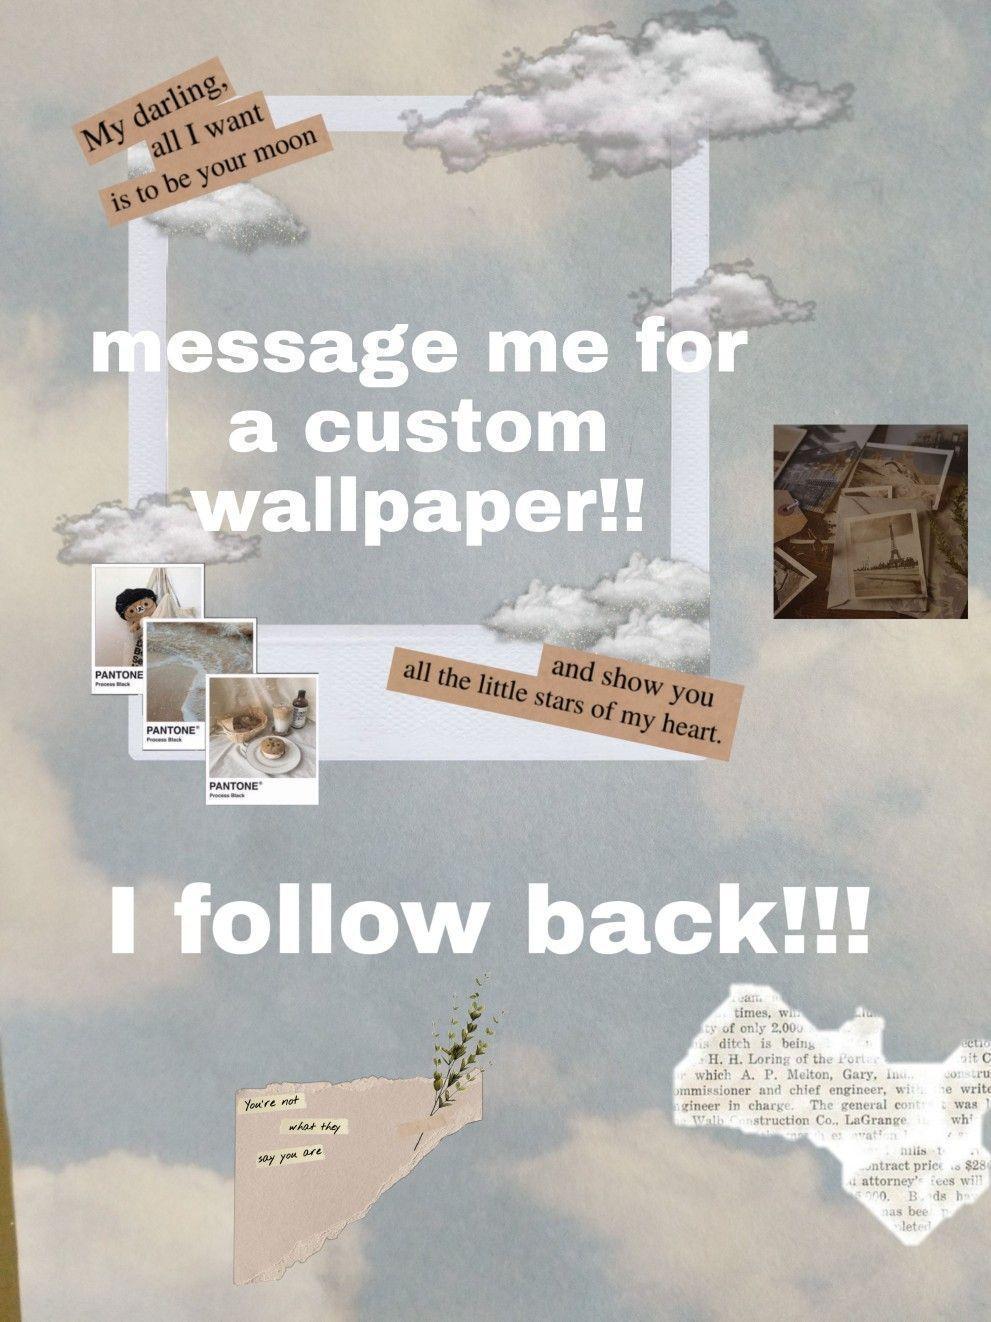 F4f Fff Follow For Follow Summer 2020 Diy Room Decor Custom Wallpaper Followers Summer Vibes Summer In 2020 Minimalist Wallpaper Spongebob Wallpaper Wallpaper